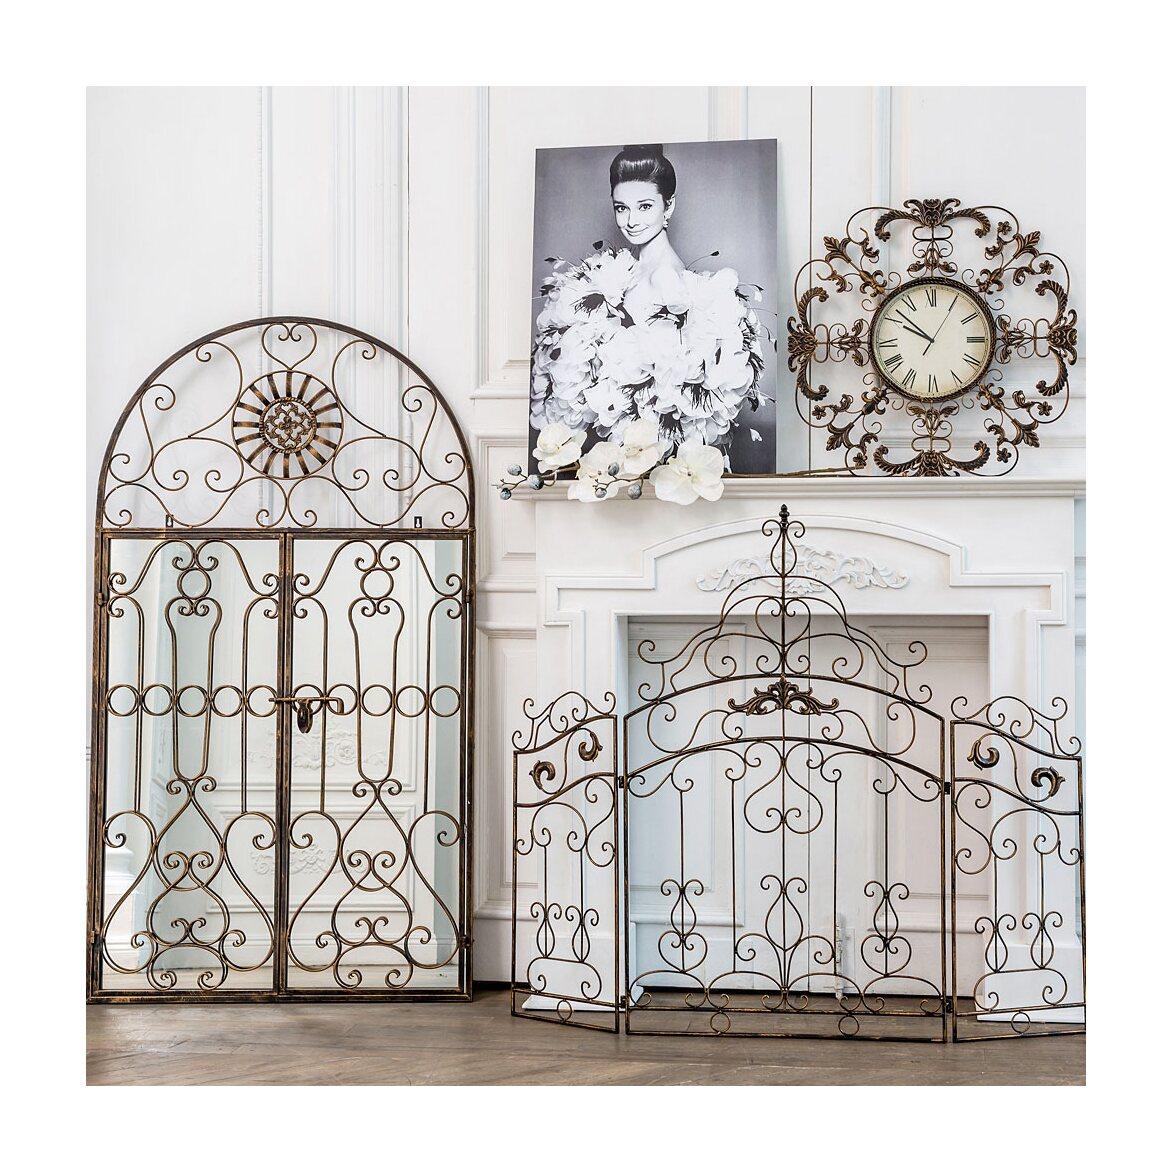 Настенное зеркало «Дивон» (королевская бронза) 2 | Настенные зеркала Kingsby